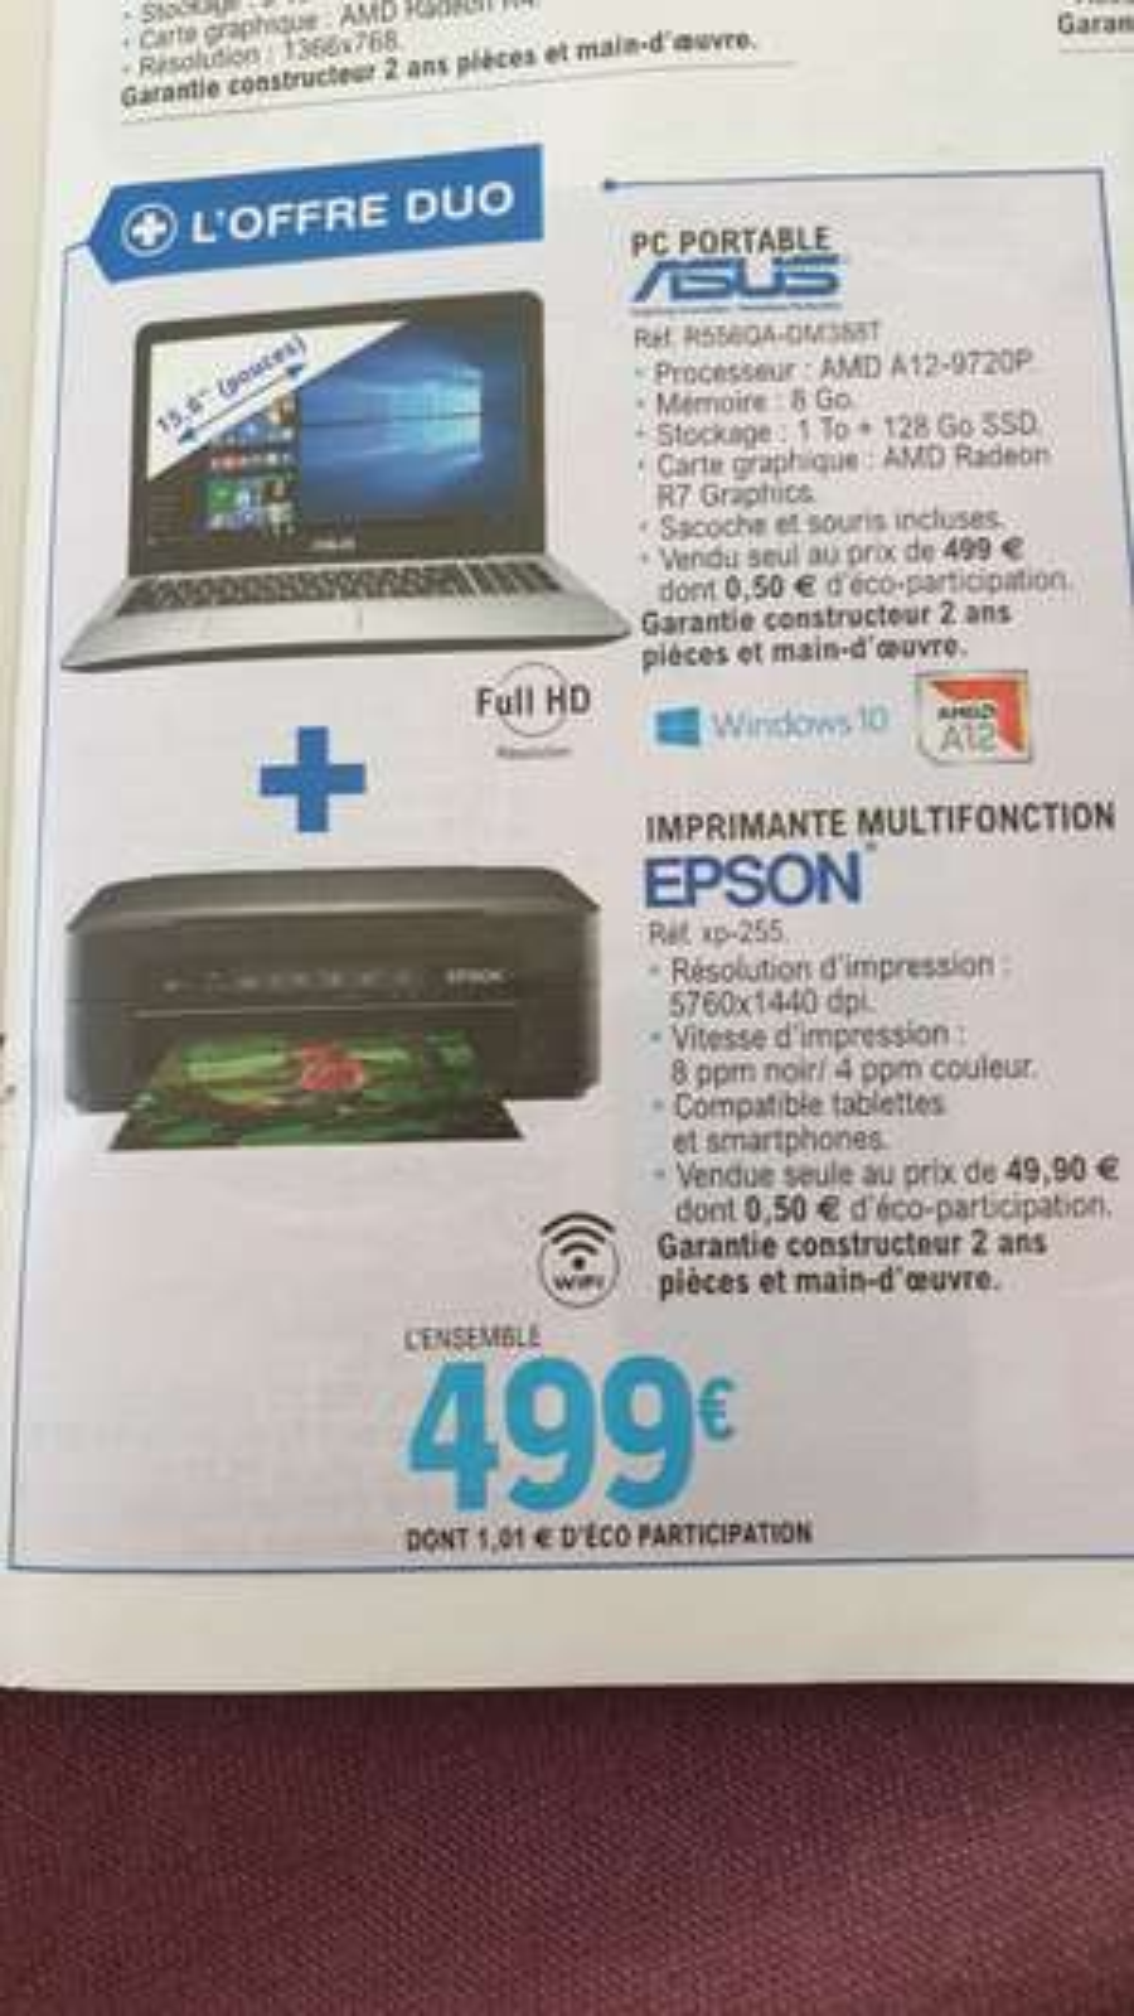 "Pc Portable 15.6"" Asus R556QA-DM388T - A12-9720P, SSD 128Go, HDD 1To, 8Go RAM, Windows 10 + Imprimante Espon XP-255 - (40, 47, 64 et 65)"